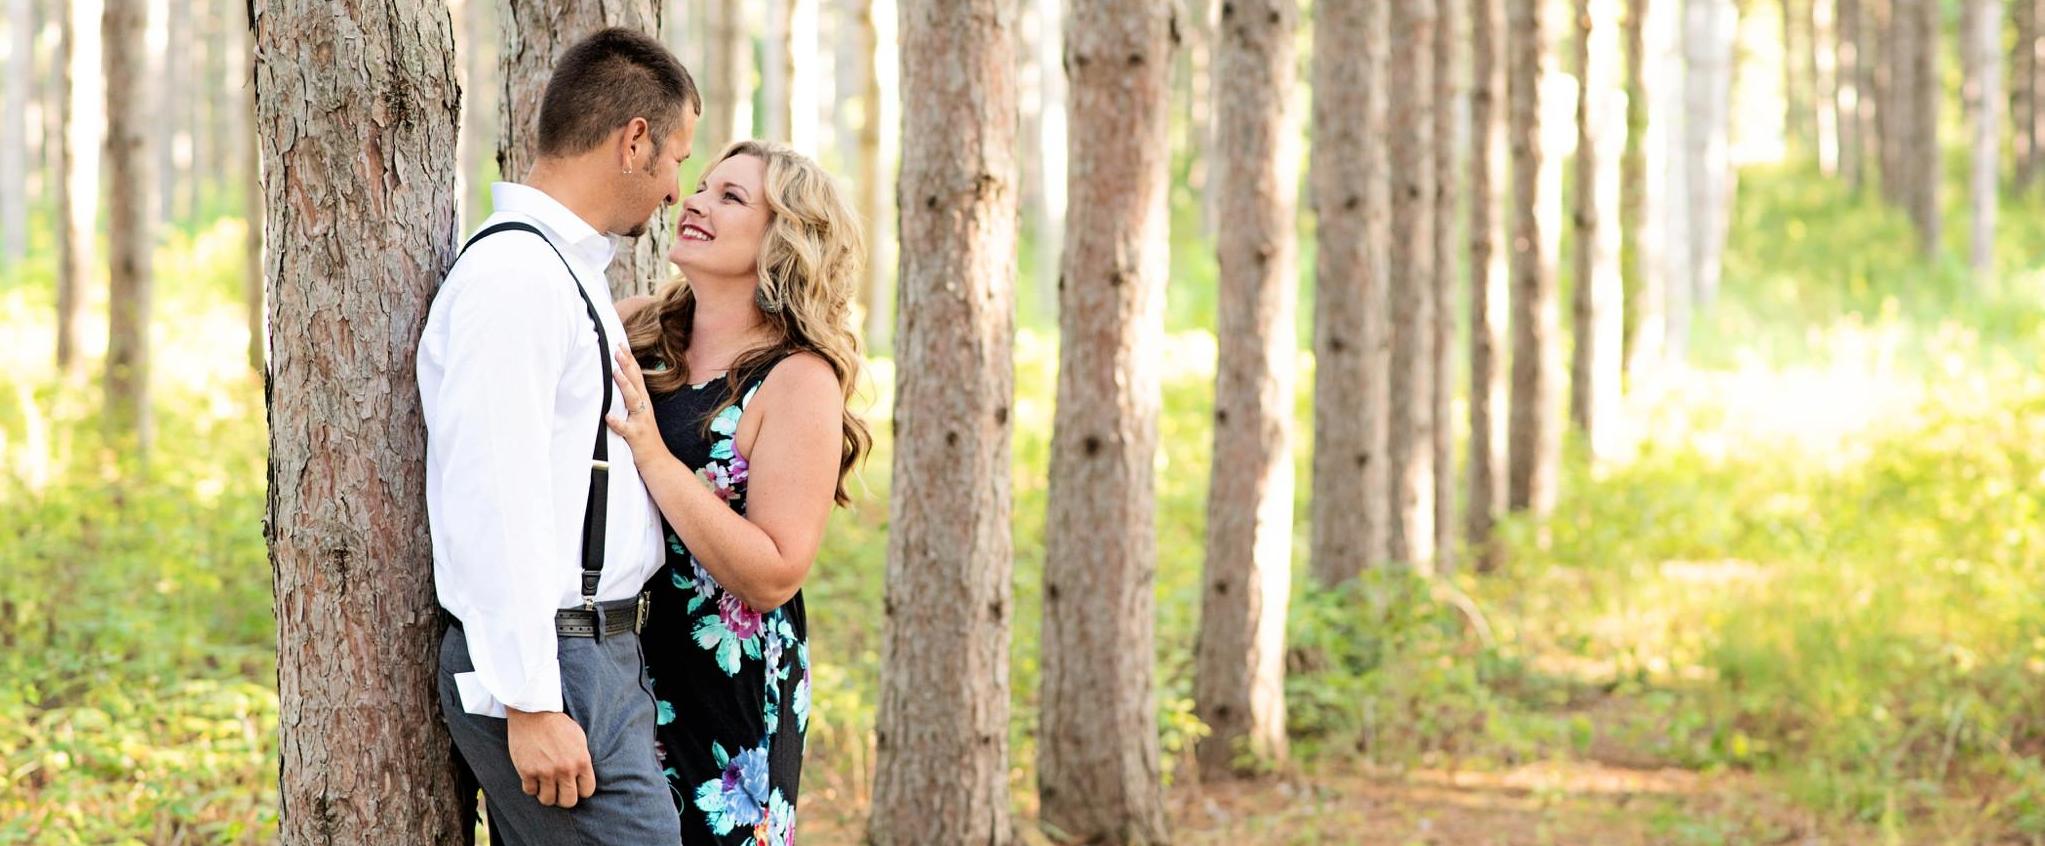 Chelsey-Ryan-Engagement-2018-Rotella-Photography-22_WEB.jpg